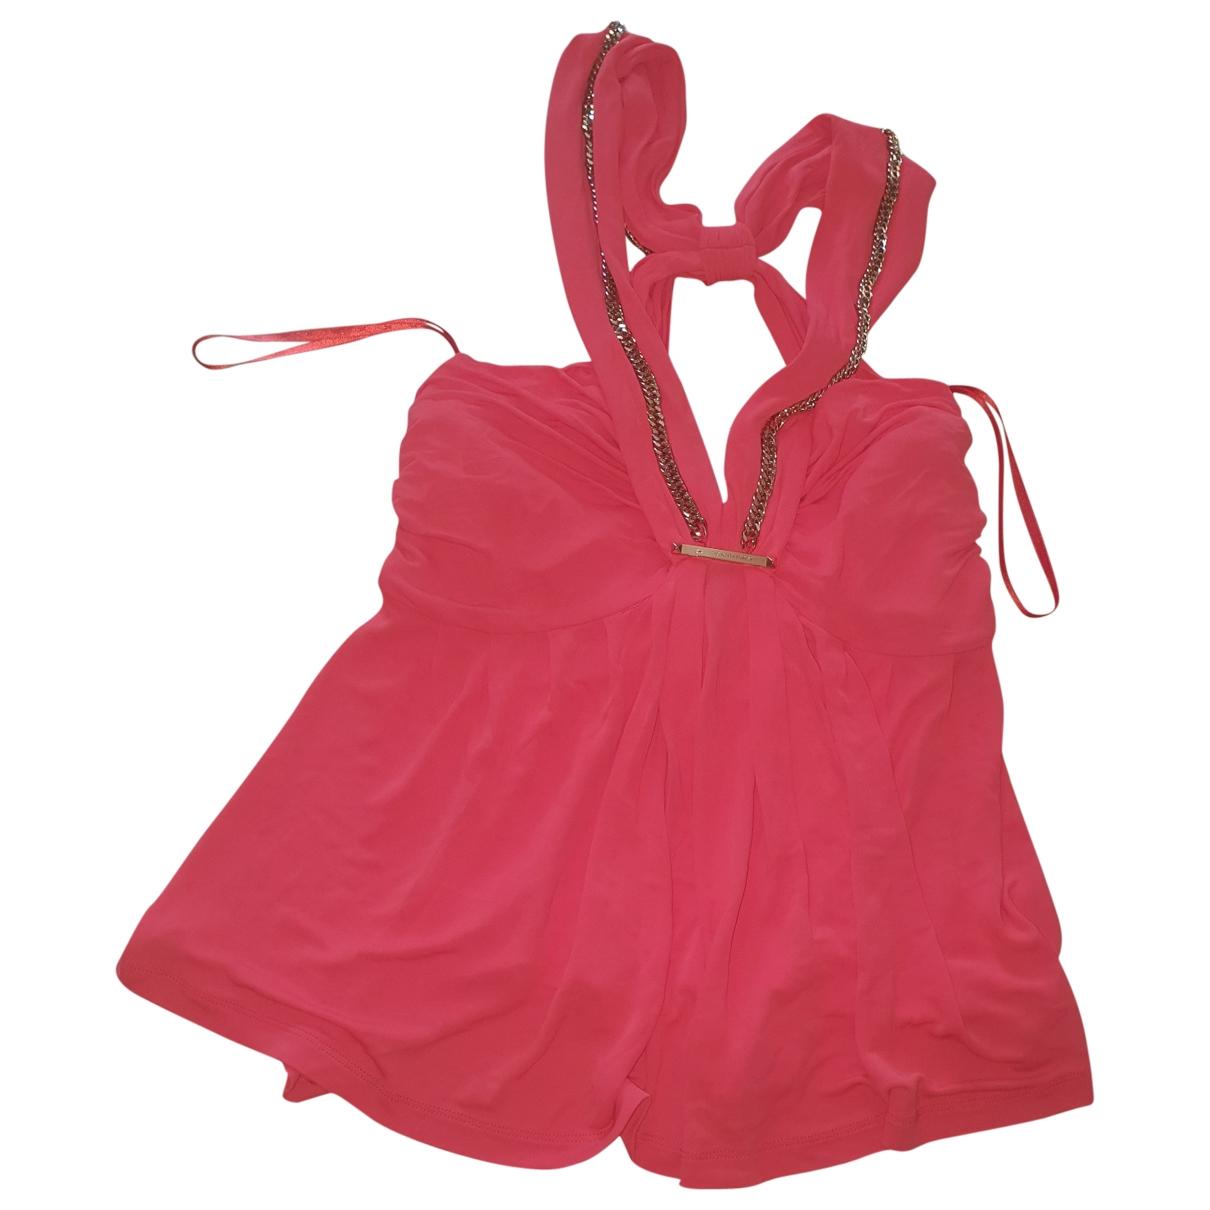 Elisabetta Franchi \N Pink  top for Women 46 IT